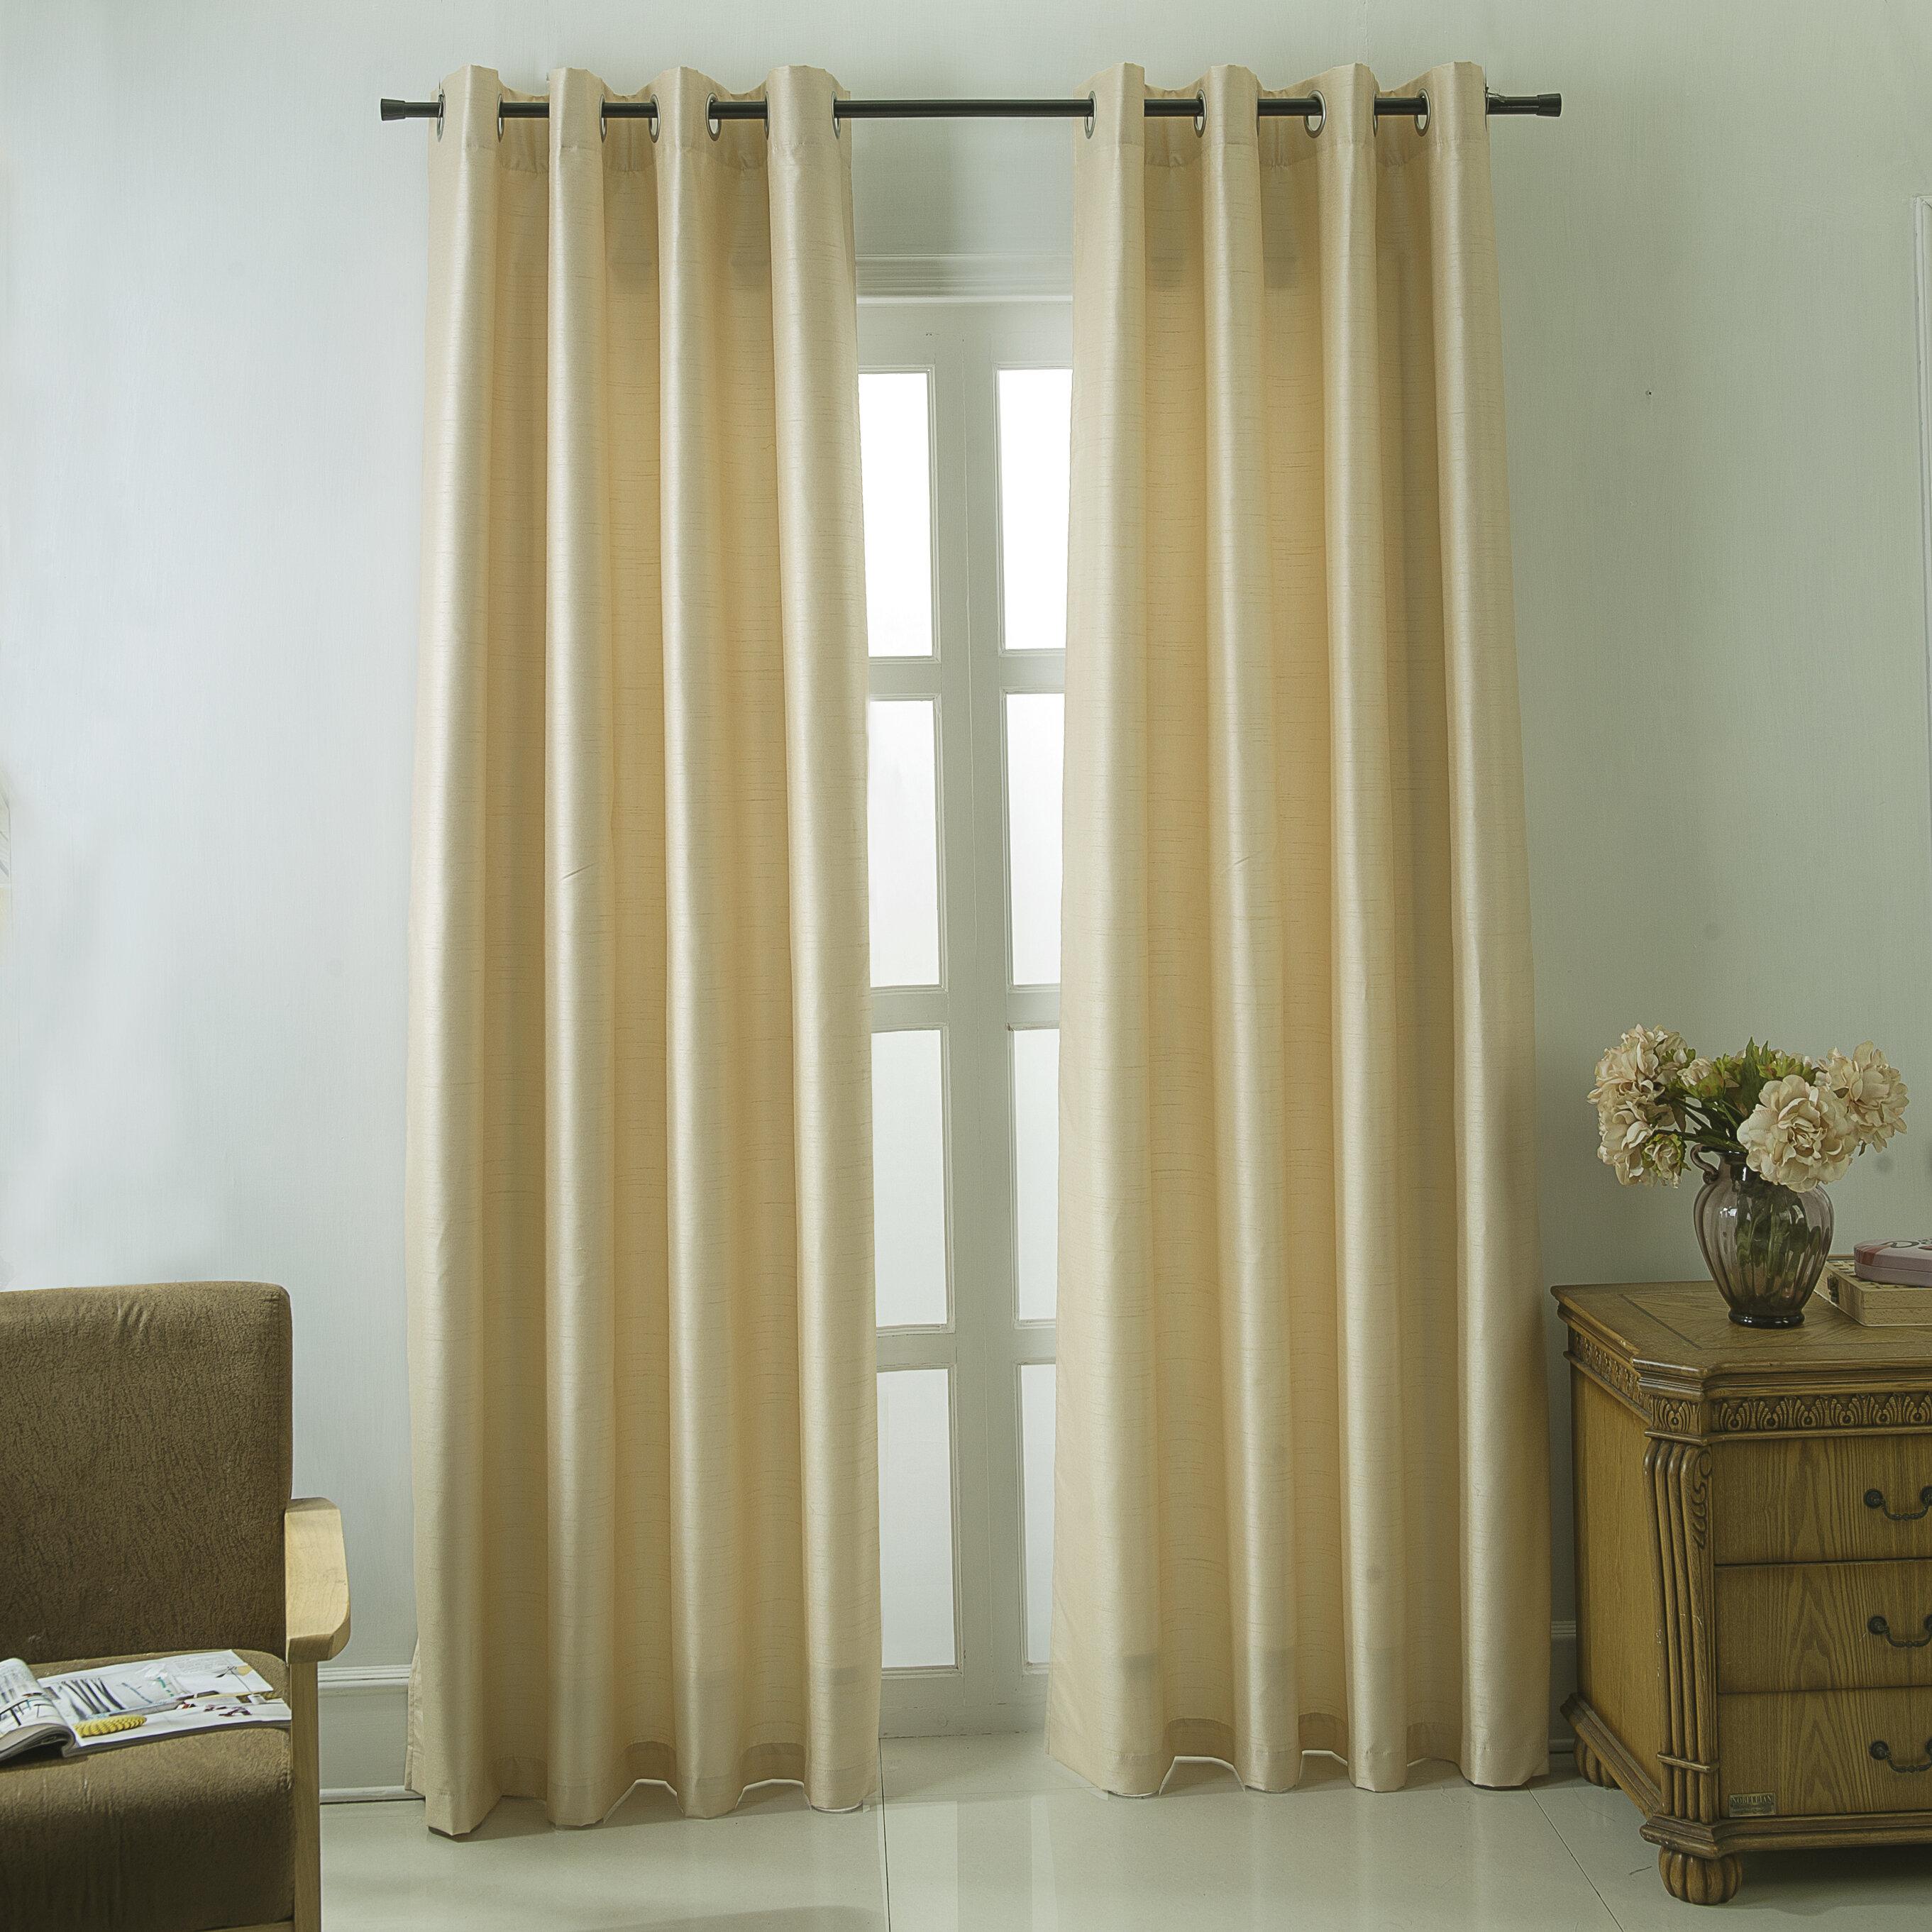 Canora Grey Schaaf Solid Room Darkening Thermal Grommet Single Curtain Panel Reviews Wayfair